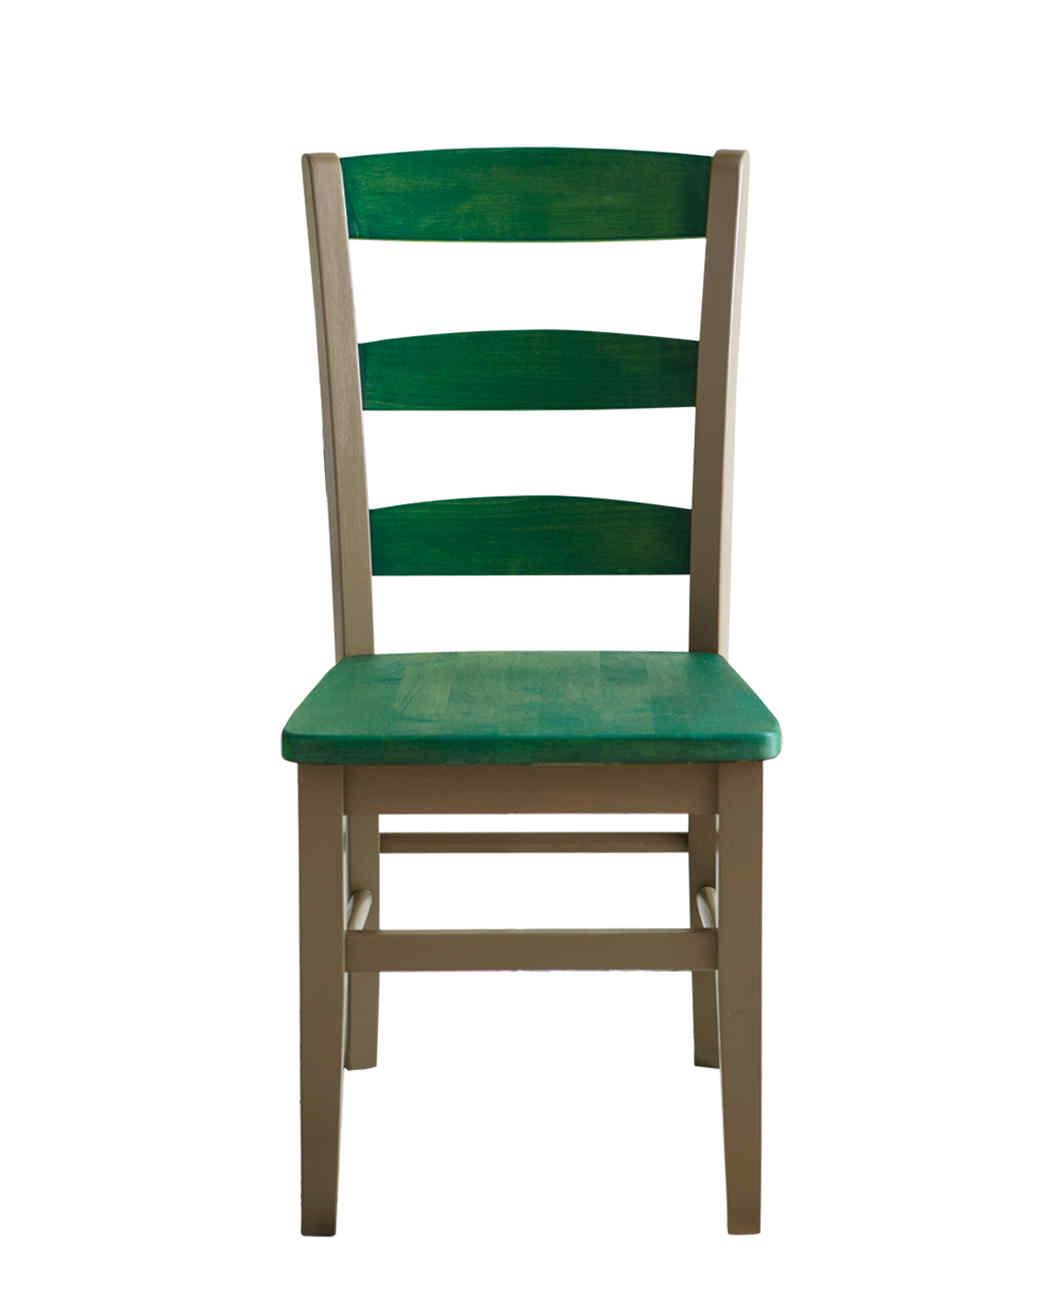 chair-finishing-touches-01-d106594-0815.jpg